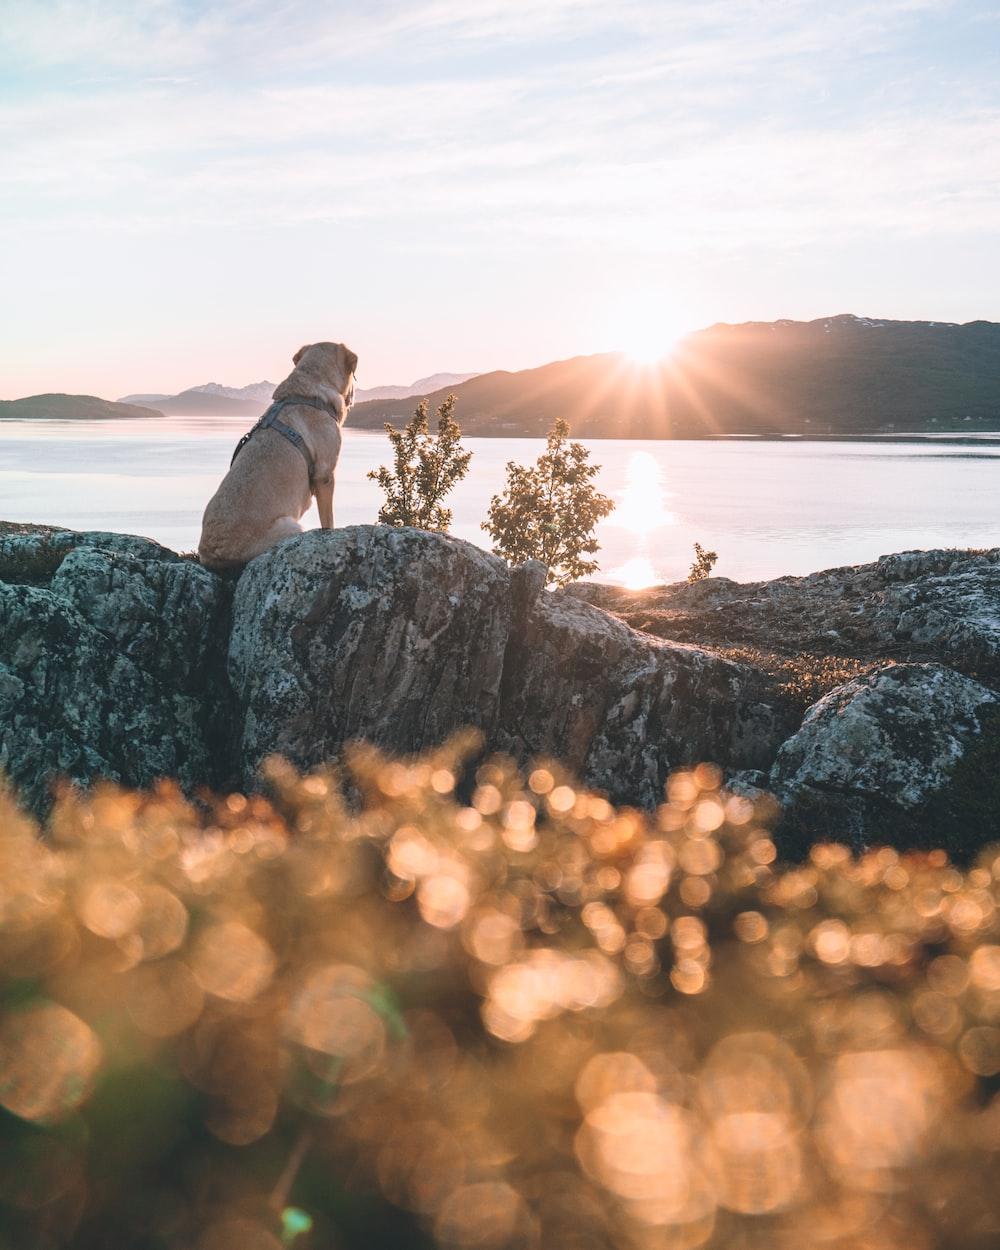 brown short coated dog on brown rock formation during daytime